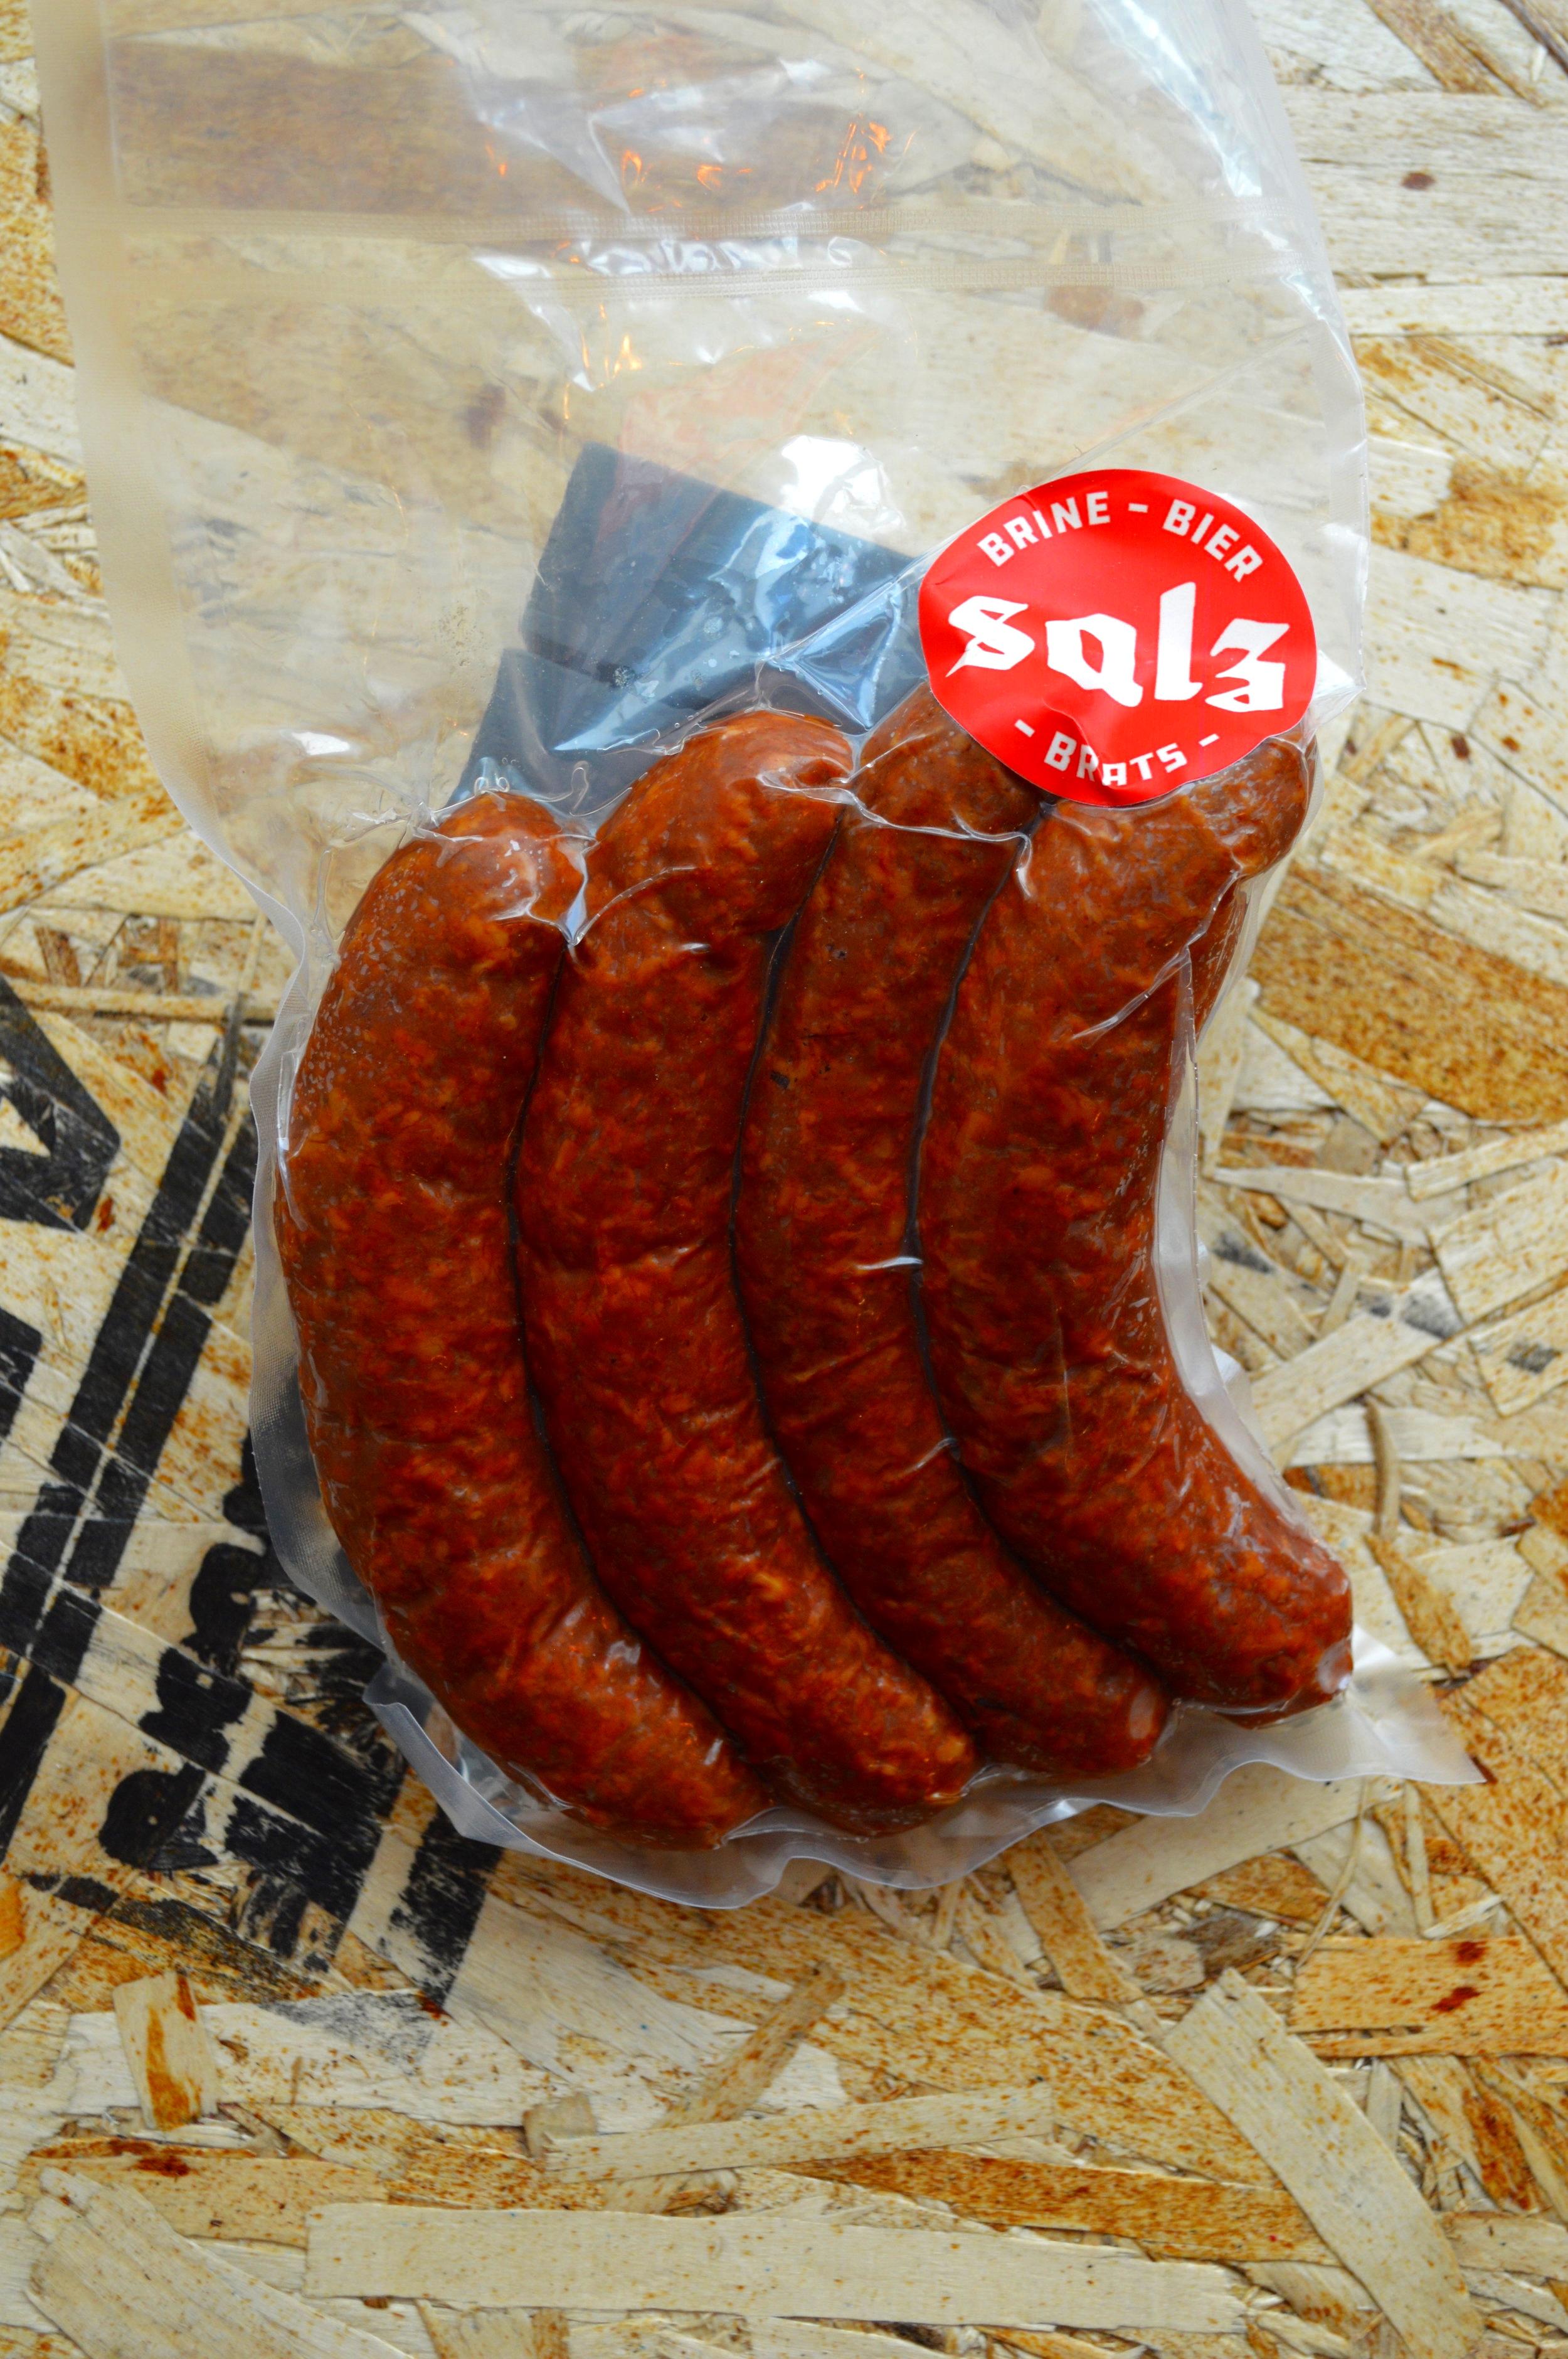 Salz Smoky merchandise pack.